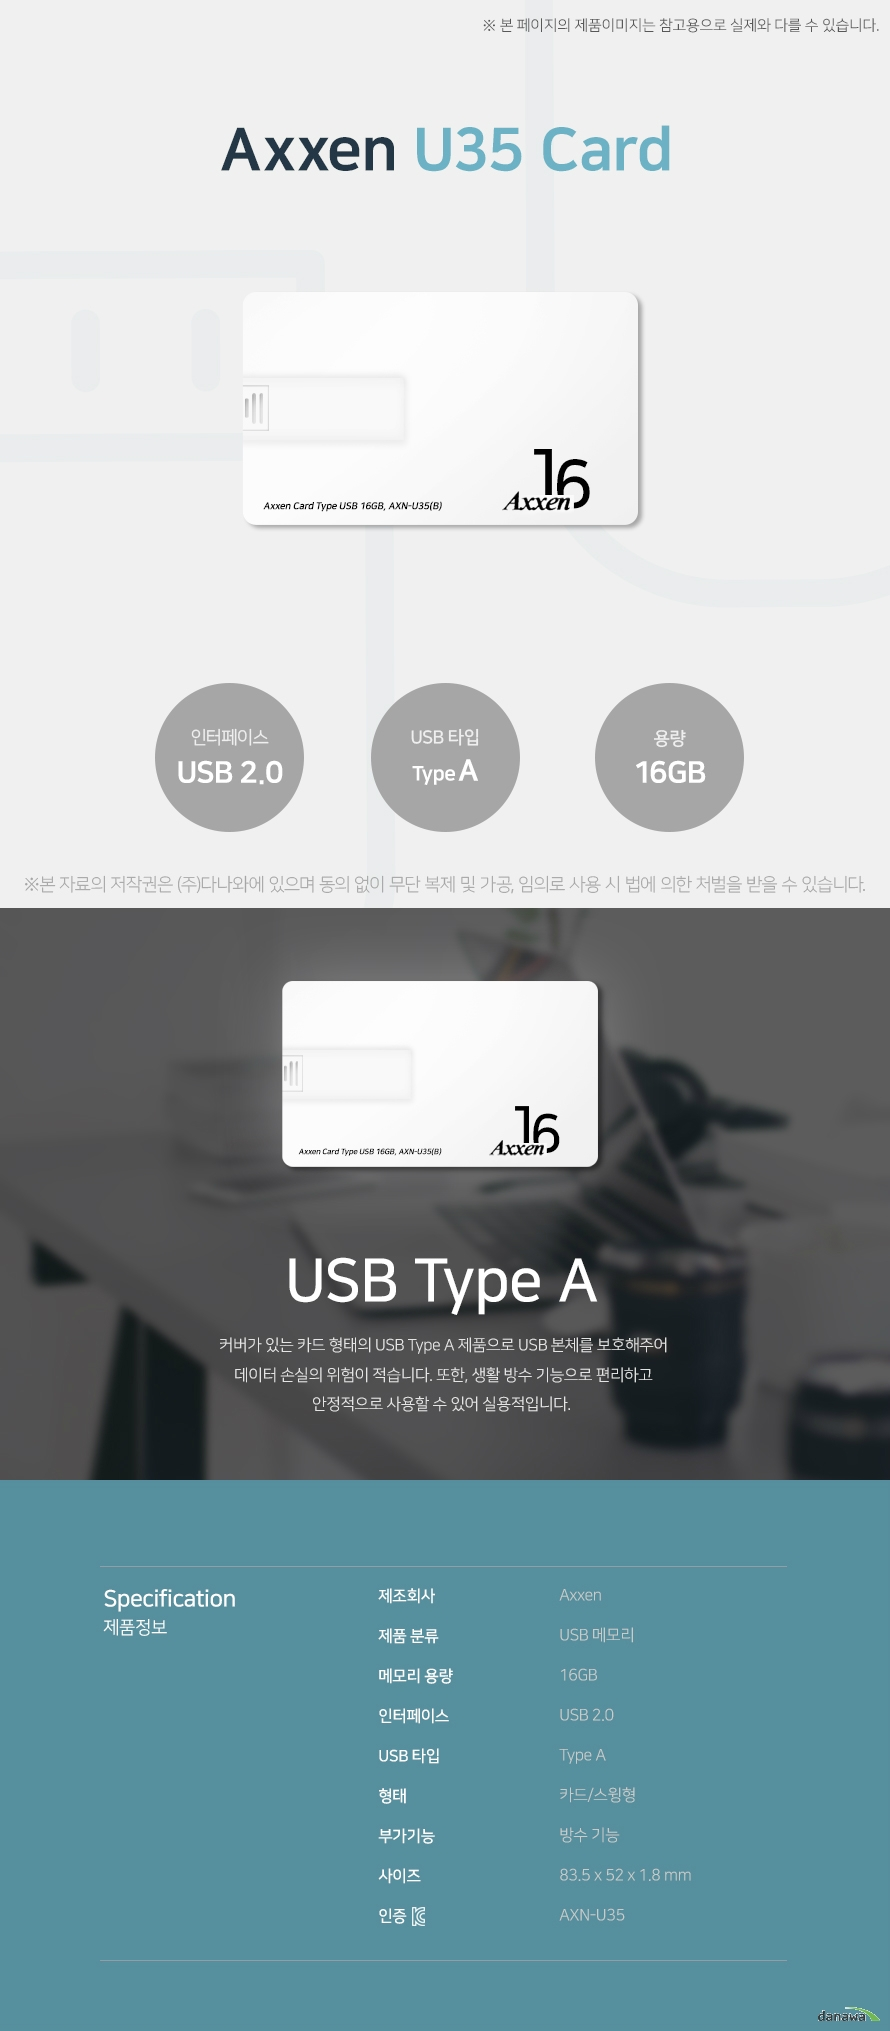 Axxen U35 Card 16GB USB Type A 커버가 있는 카드 형태의 USB Type A 제품으로 USB 본체를 보호해주어 데이터 손실의   의험이 적습니다. 또한, 생활 방수 기능으로 편리하고 안정적으로 사용할 수 있어 실용적입니다. 스펙 제조회사 AXXEN 제품 분류 USB 메모리 메모리 용량 16GB 인터페이스 USB 2.0 USB 타입 Type A 형태 카드/스윙형 부가기능 방수 기능 사이즈 83.5x52x1.8mm KC인증 AXN-U35